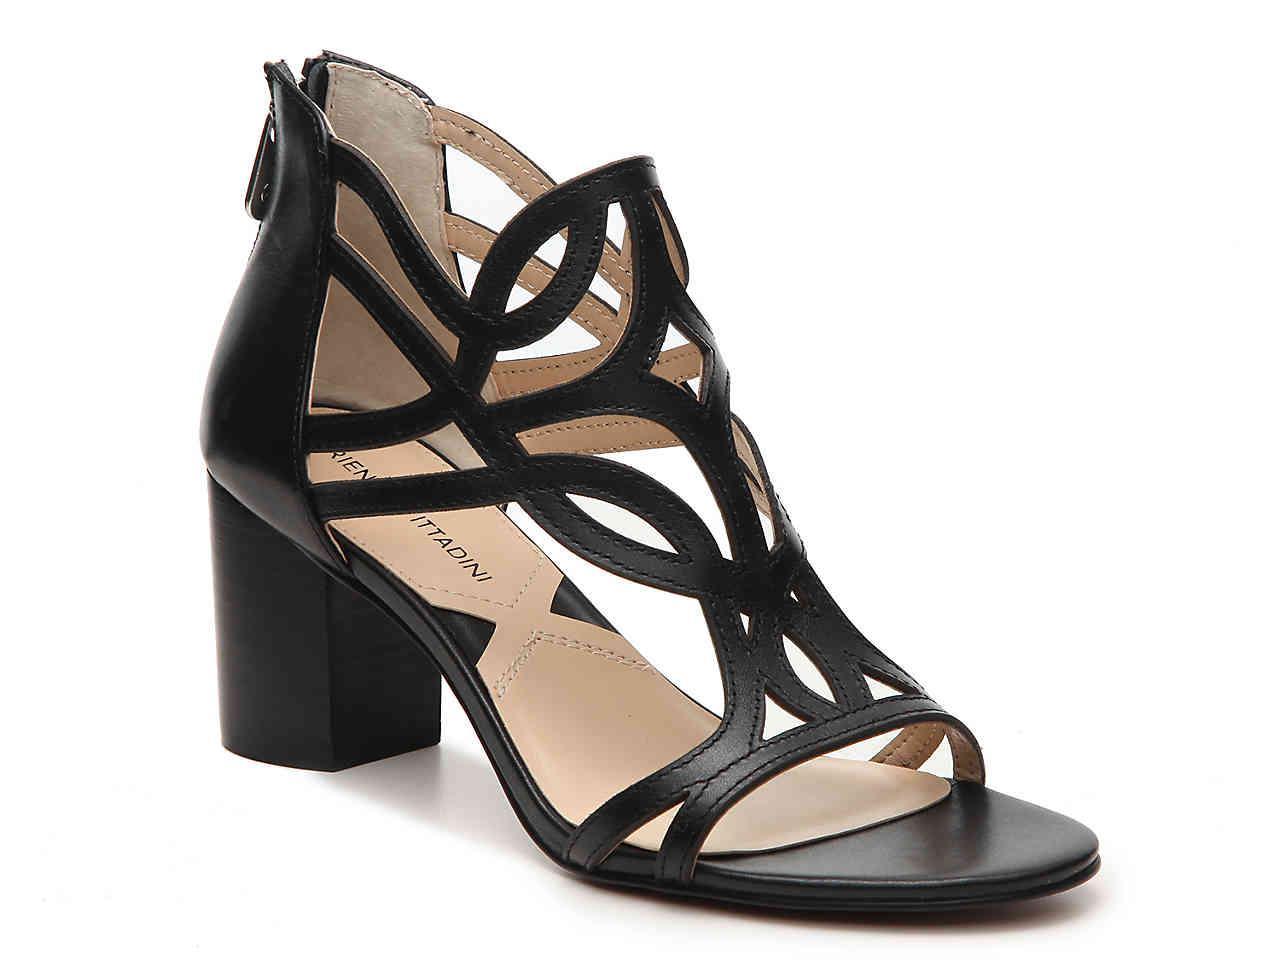 8f042ac2a5 Adrienne Vittadini Perlin Sandal in Black - Lyst